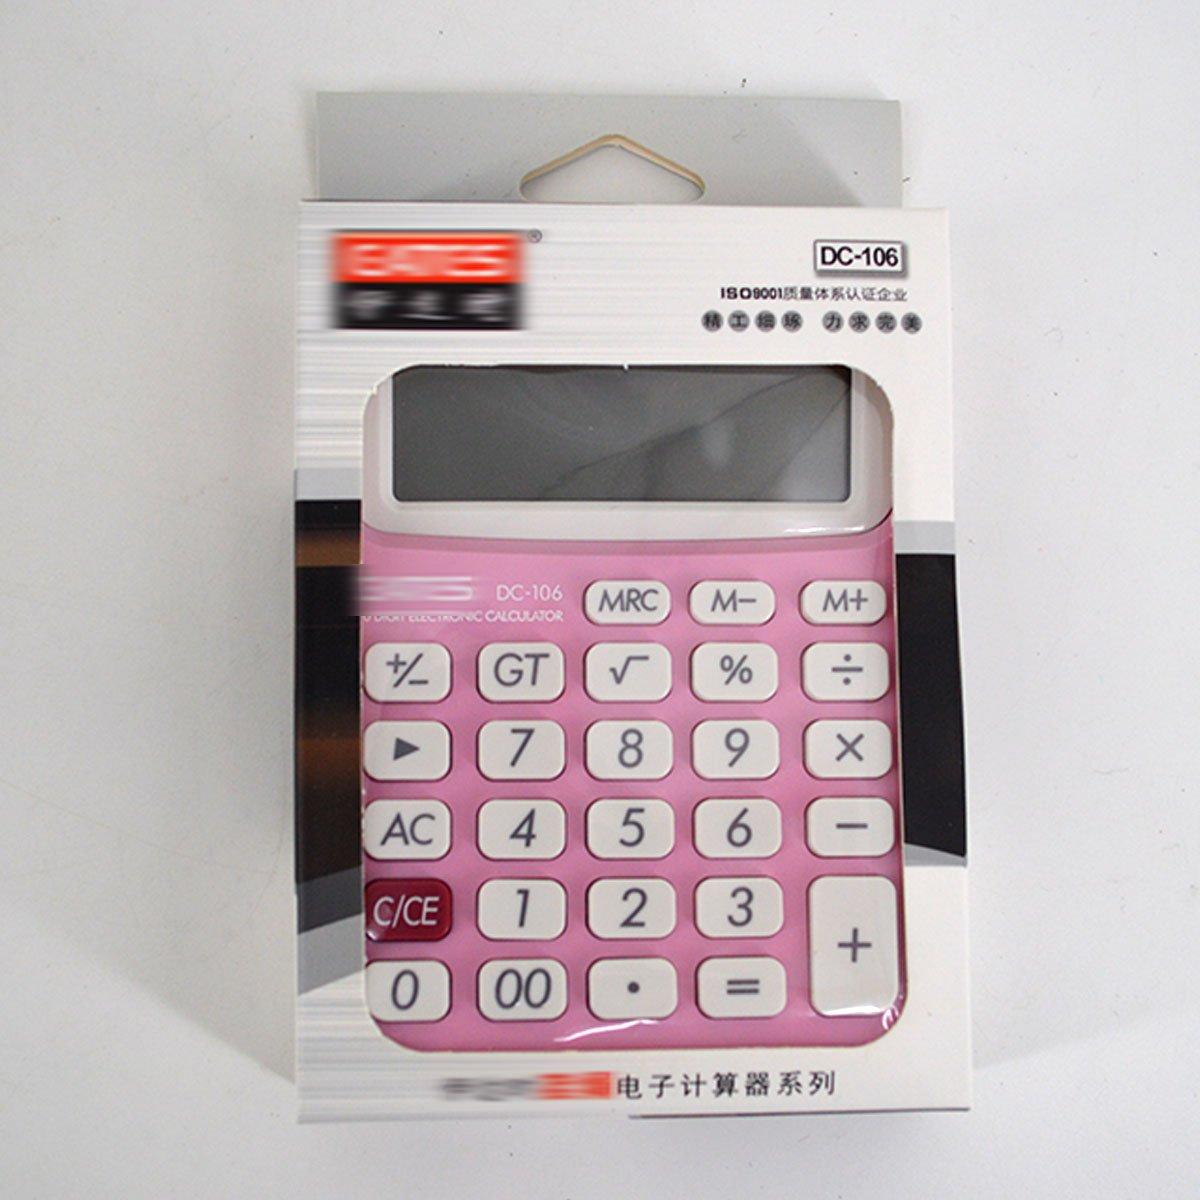 Clara Home Office School Use Calculator Portable Calculator Large LCD Display Calculator(Pink) by CLARA (Image #7)